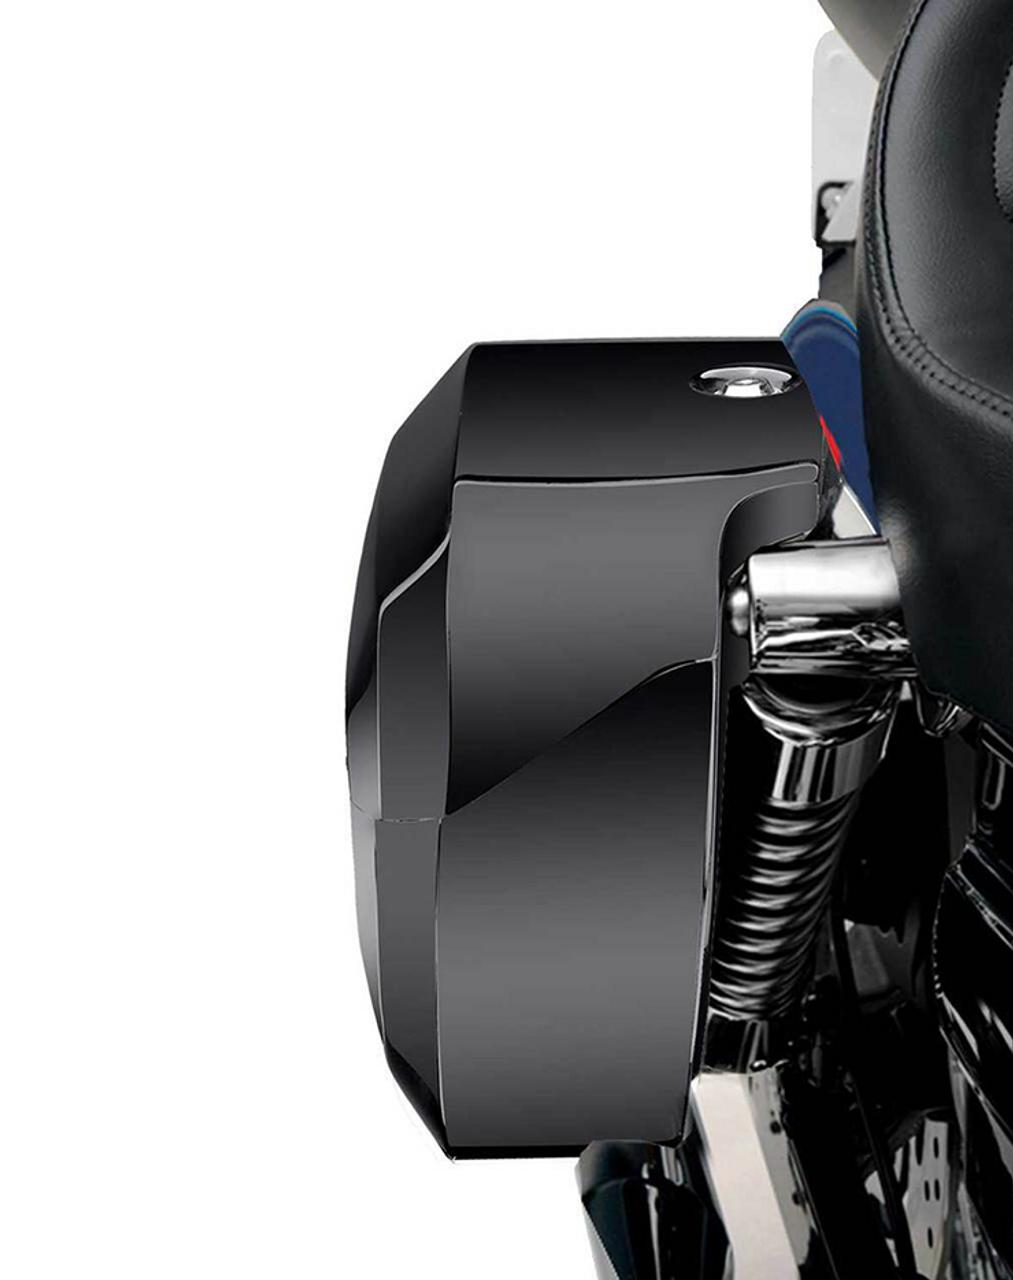 Kawasaki 1600 Mean Streak Viking Lamellar Large Spear Shock Cutout Hard Saddlebags Shock Cutout View